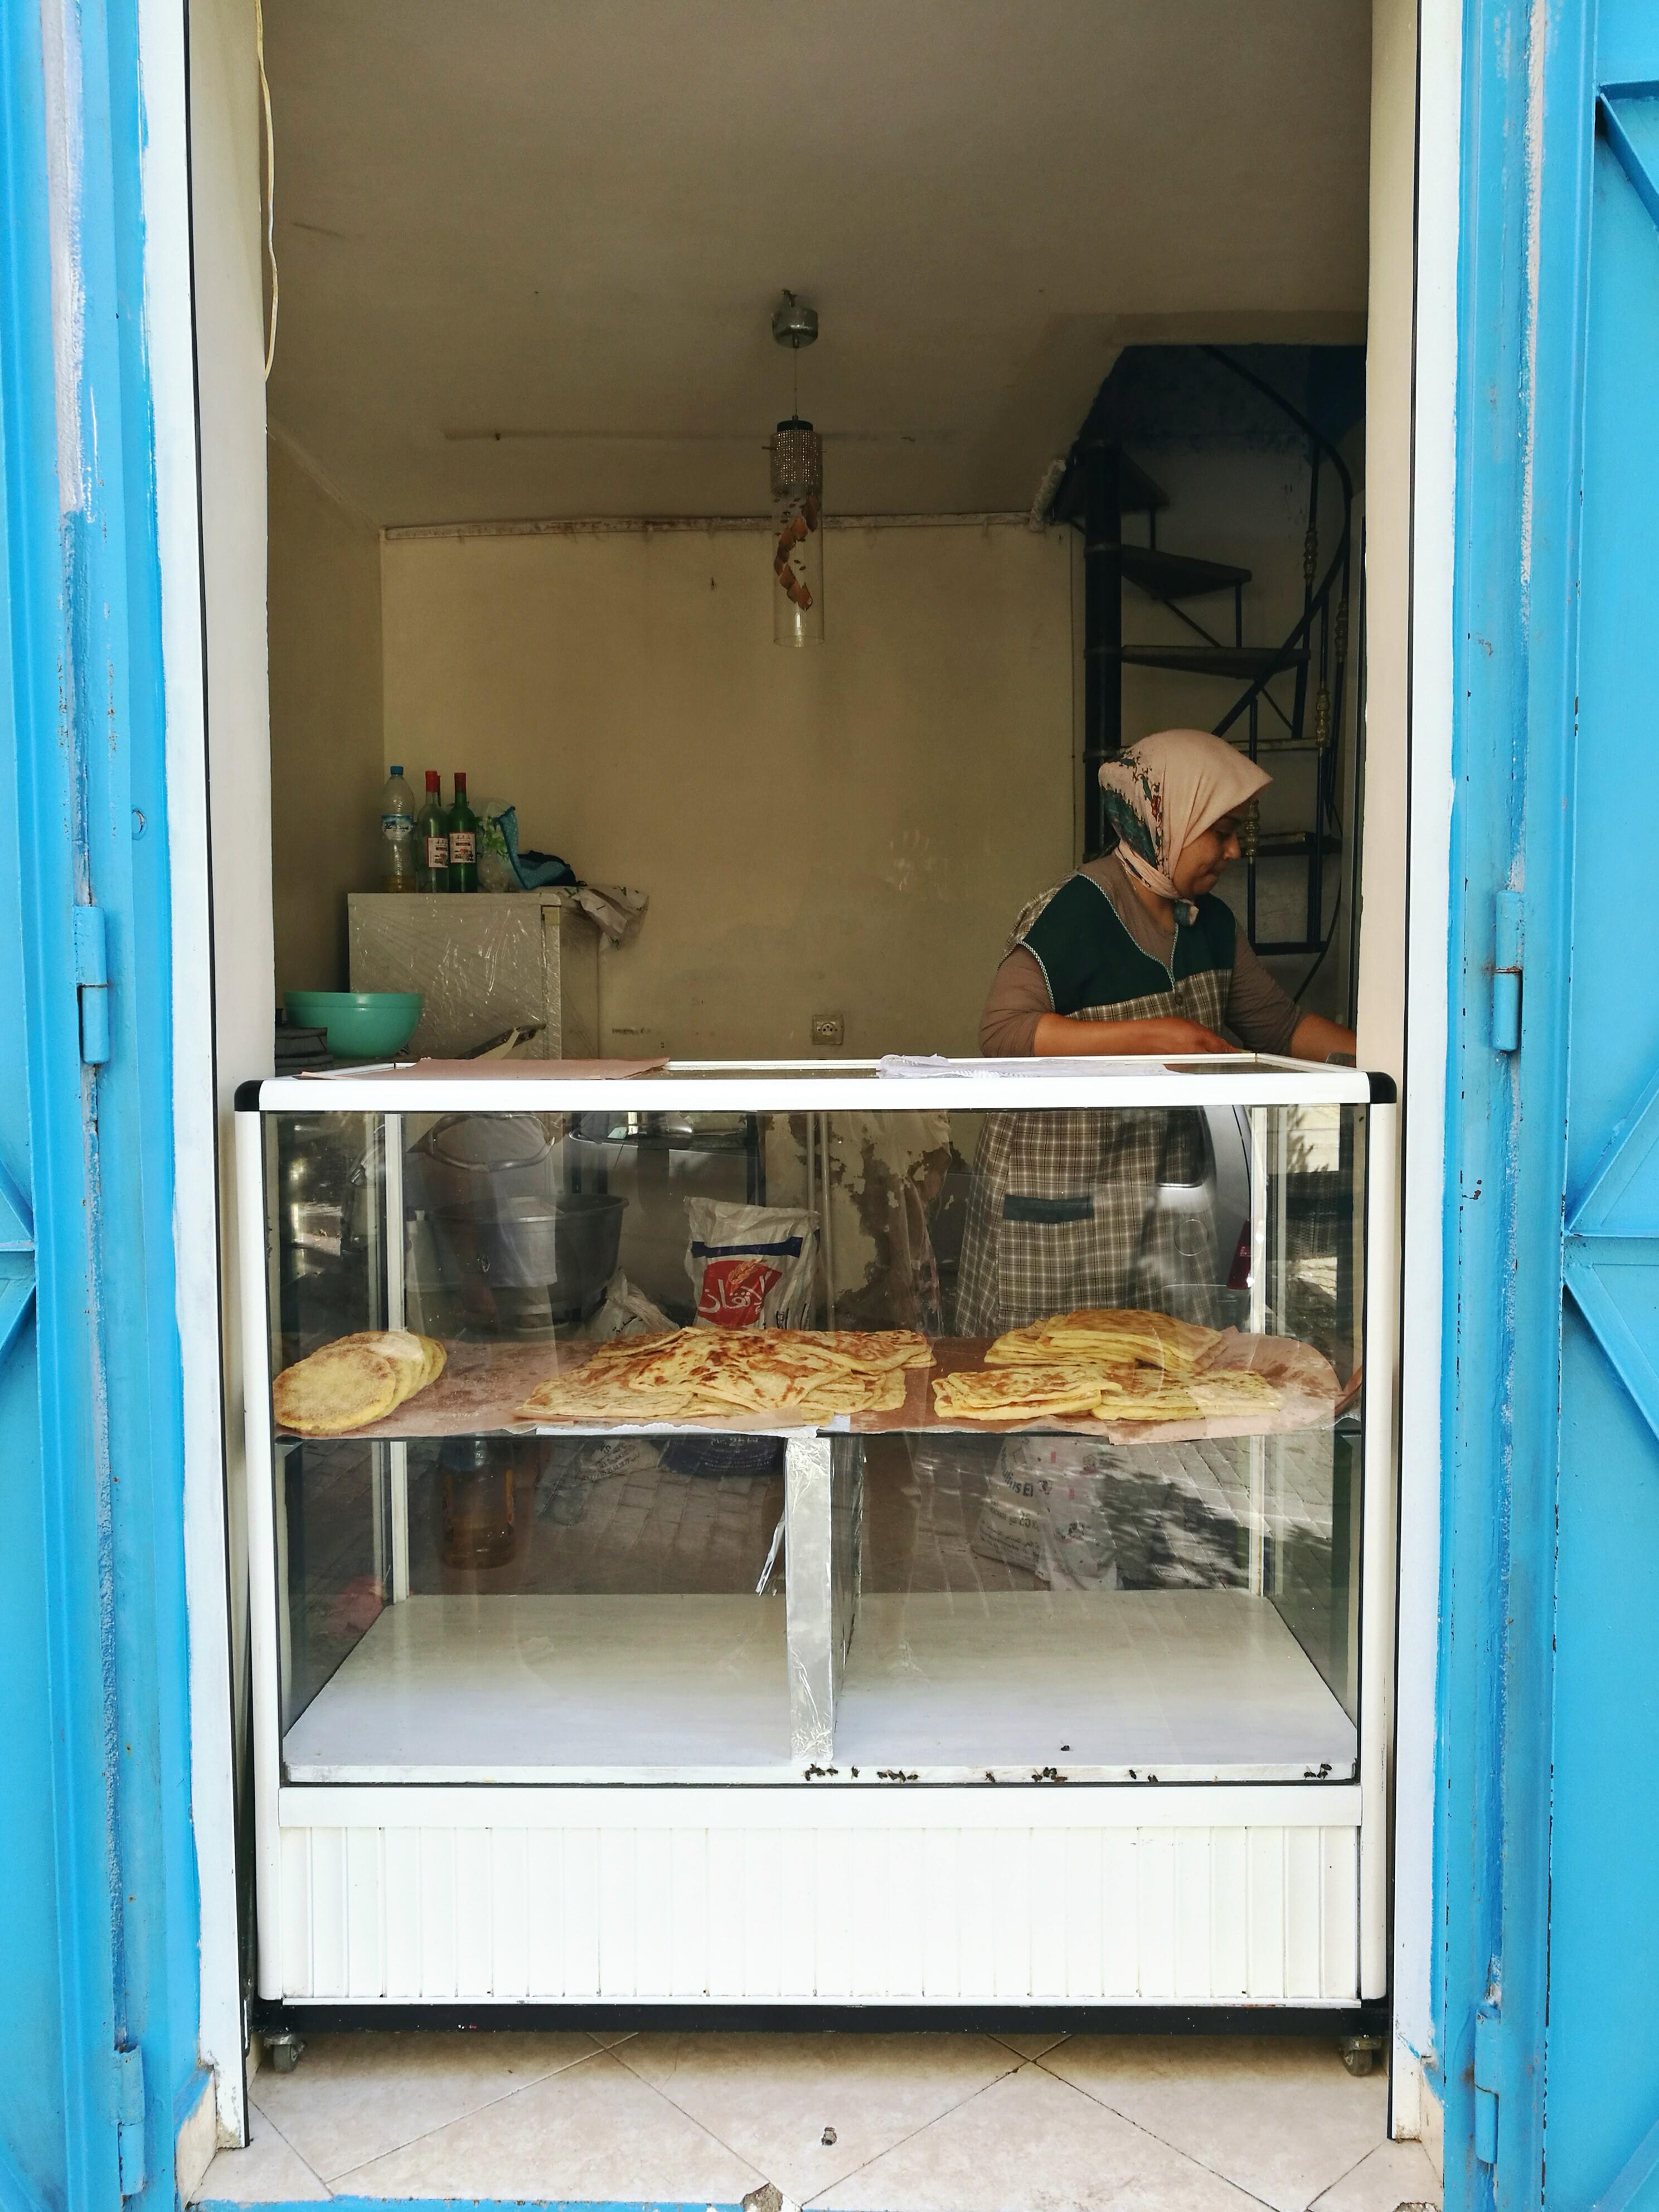 Marokanska pekarnica